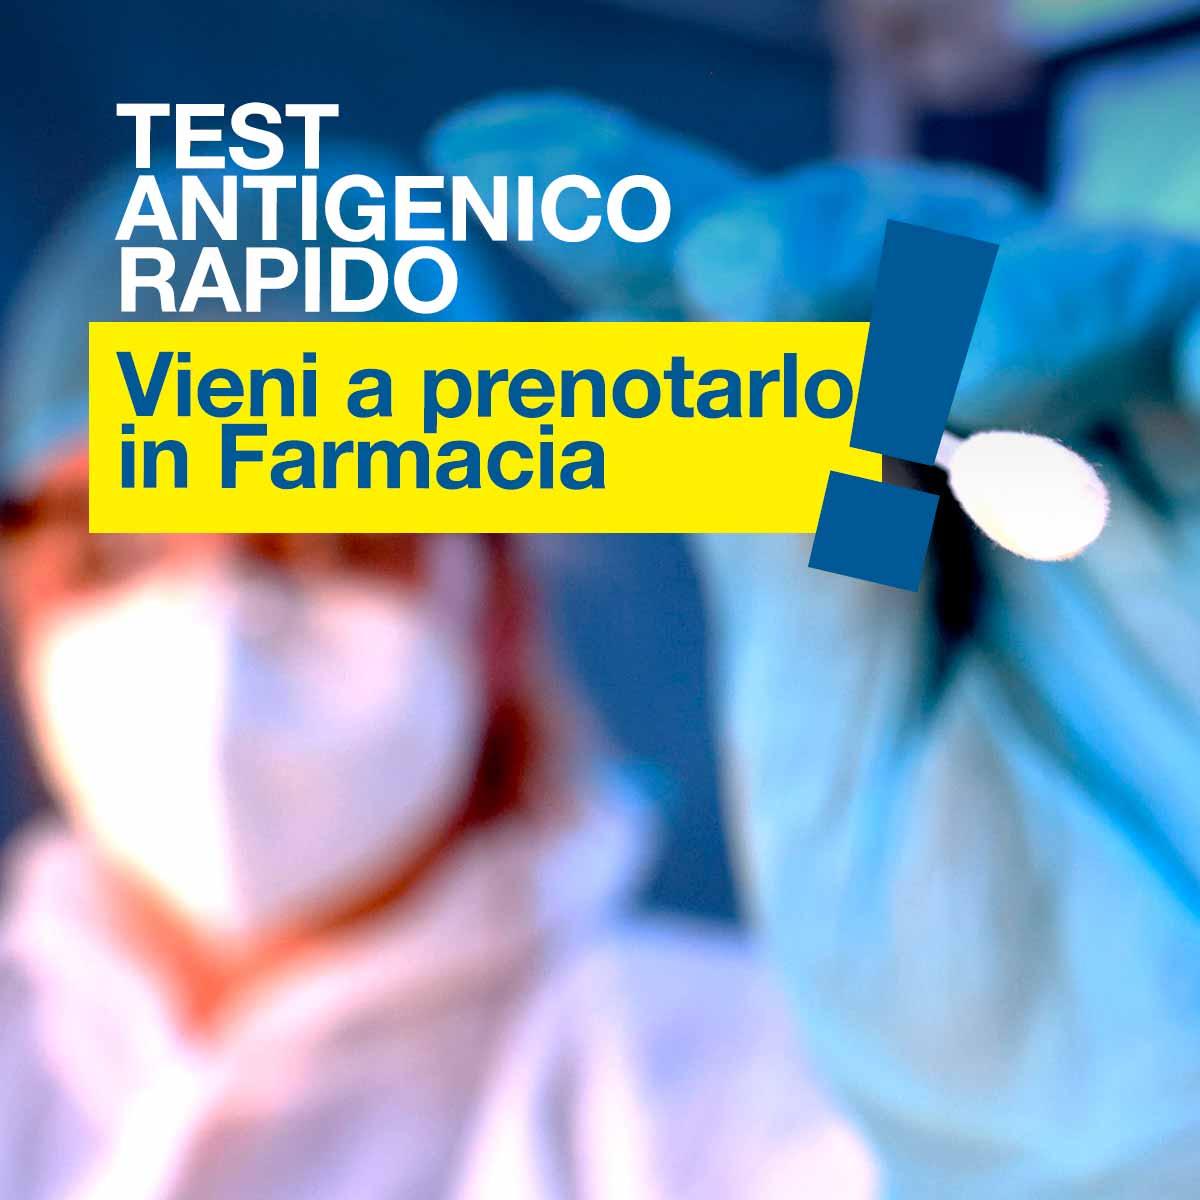 Test Antigienico Rapido